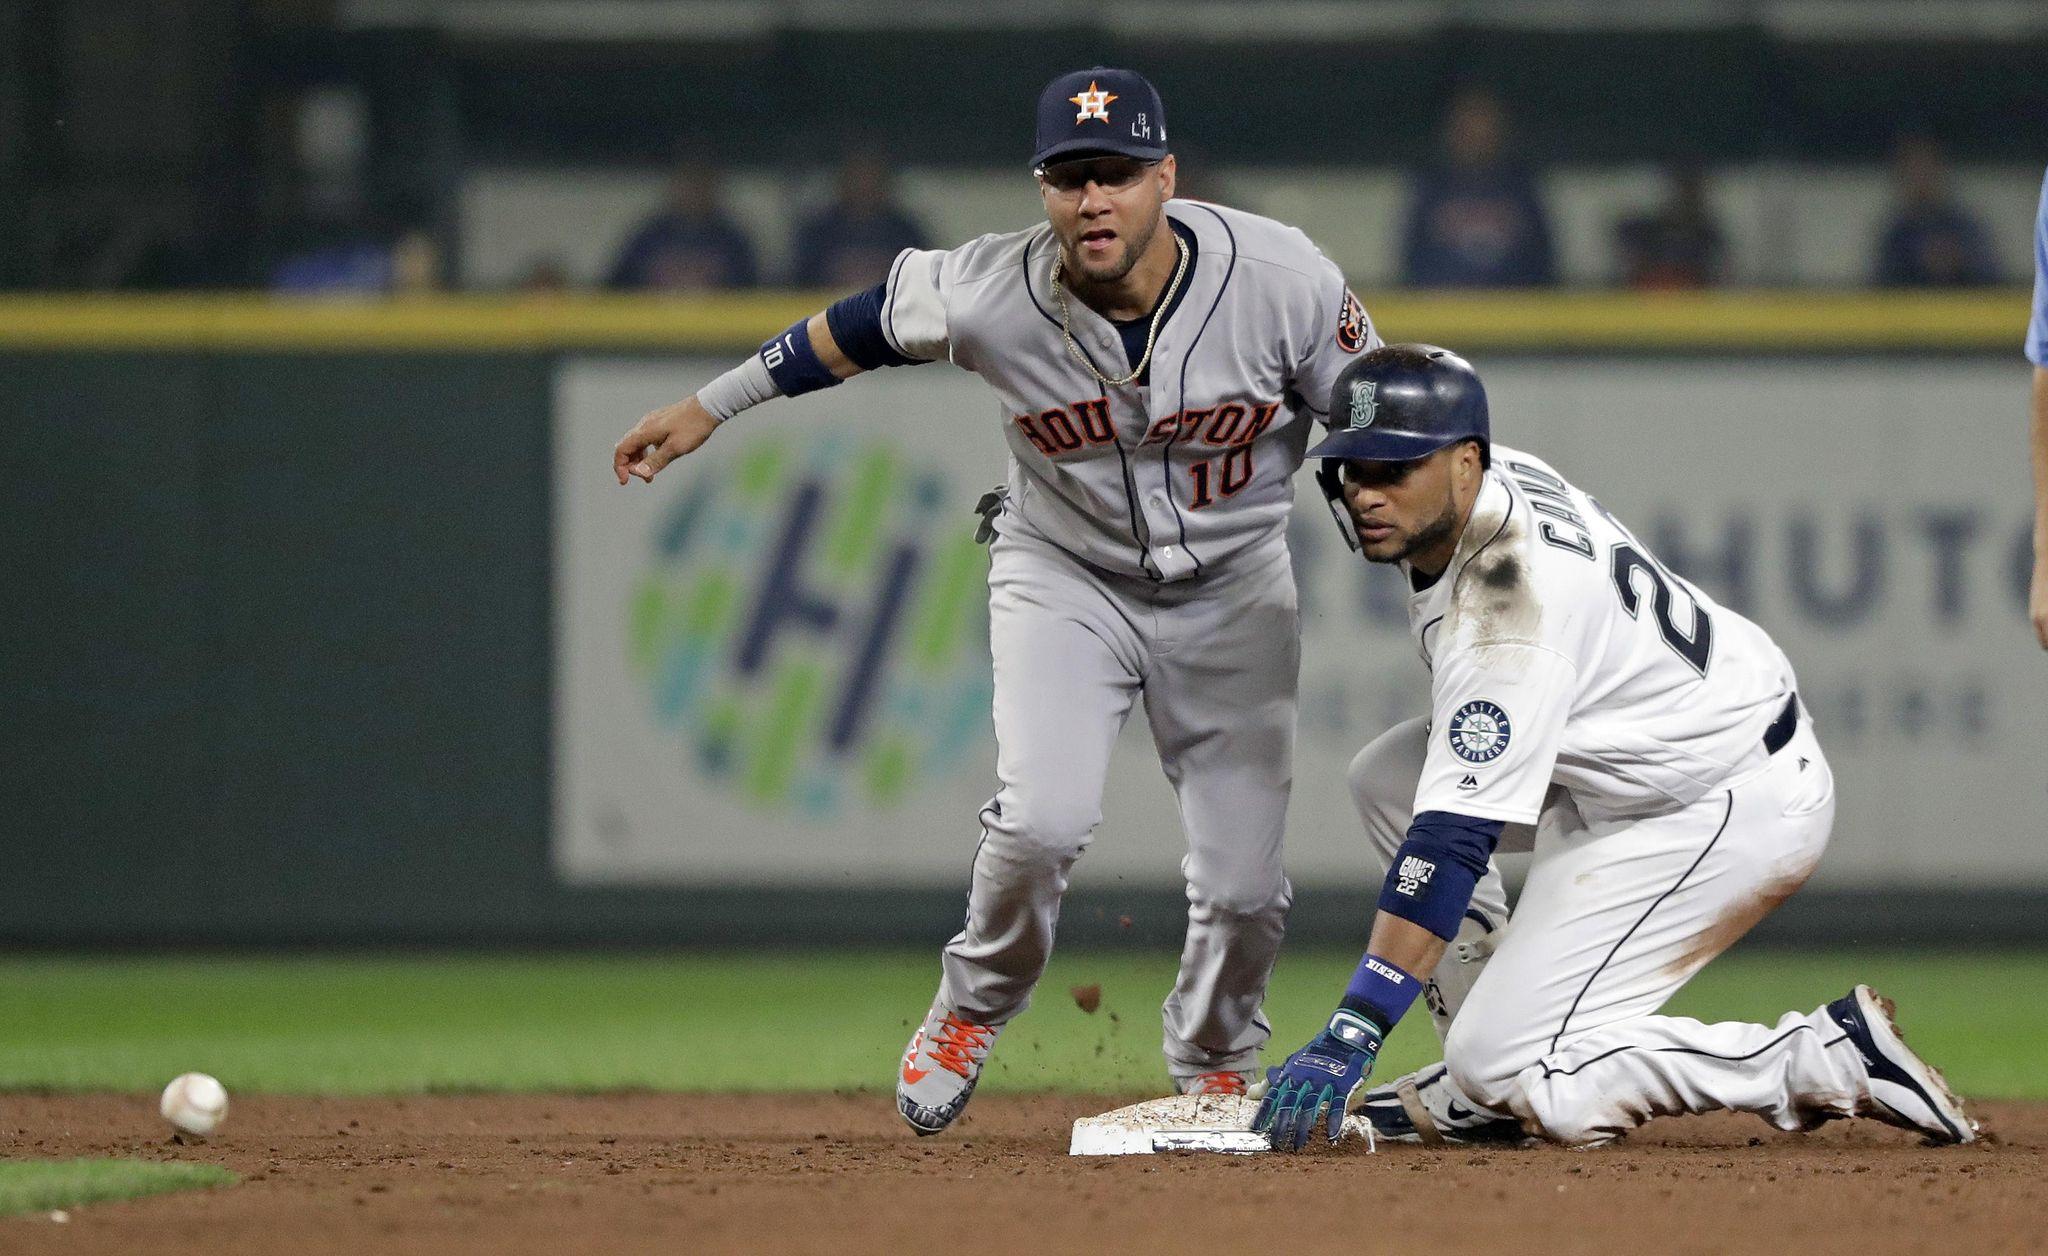 Astros_mariners_baseball_17632_s2048x1256